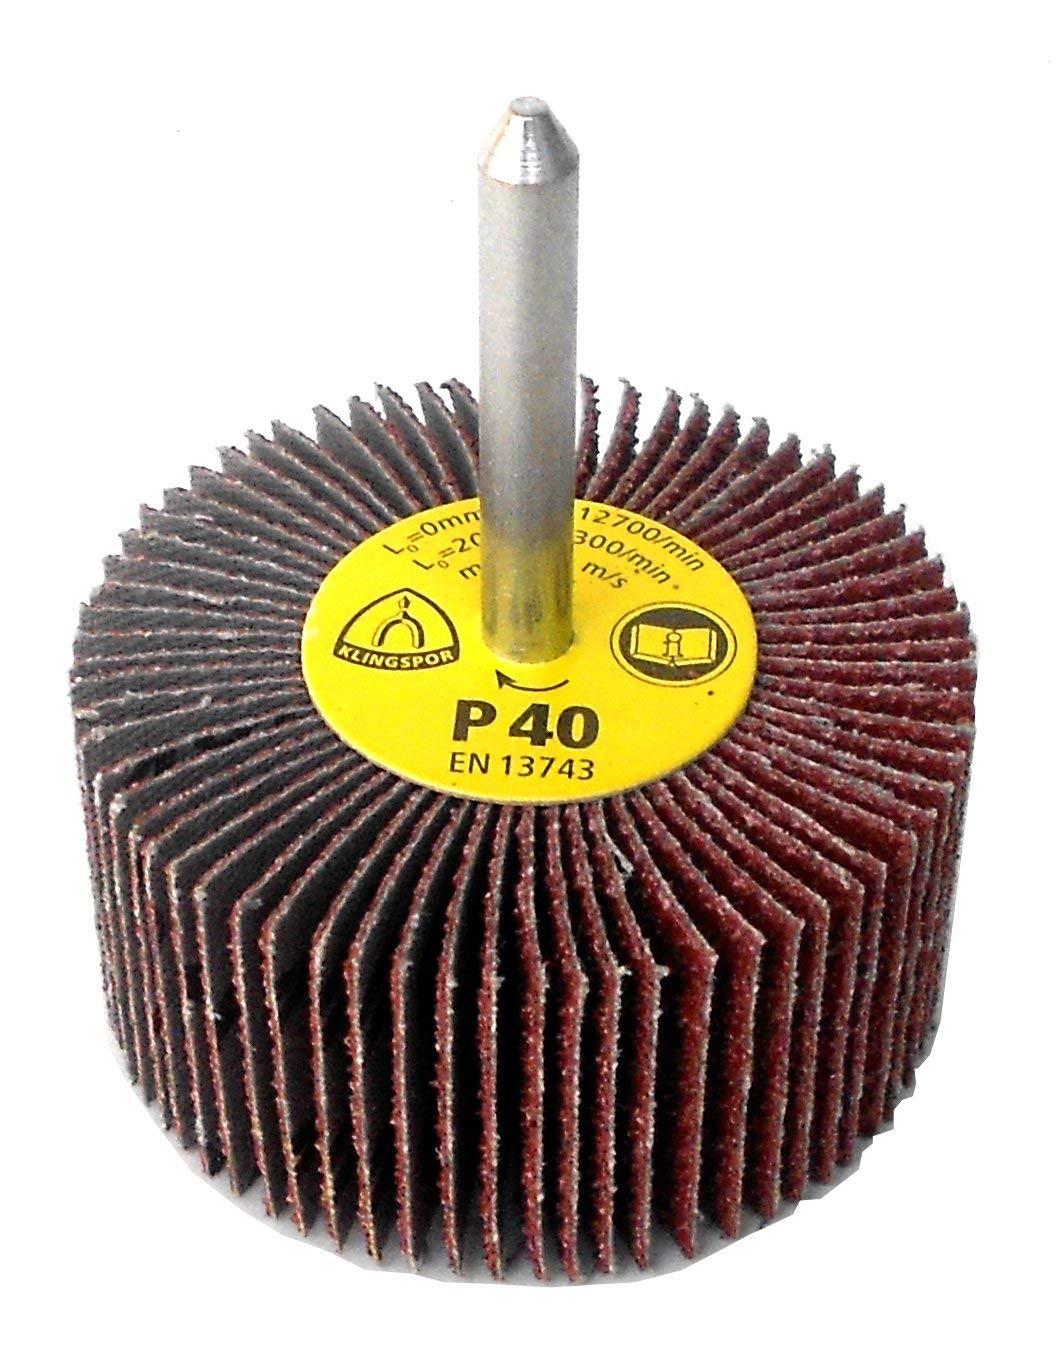 | 5 St/ück K/örnung: 100 Schaftdurchmesser: 6 mm 60 x 30 mm Klingspor KM 613 F/ächerschleifer//Lamellenschleifer